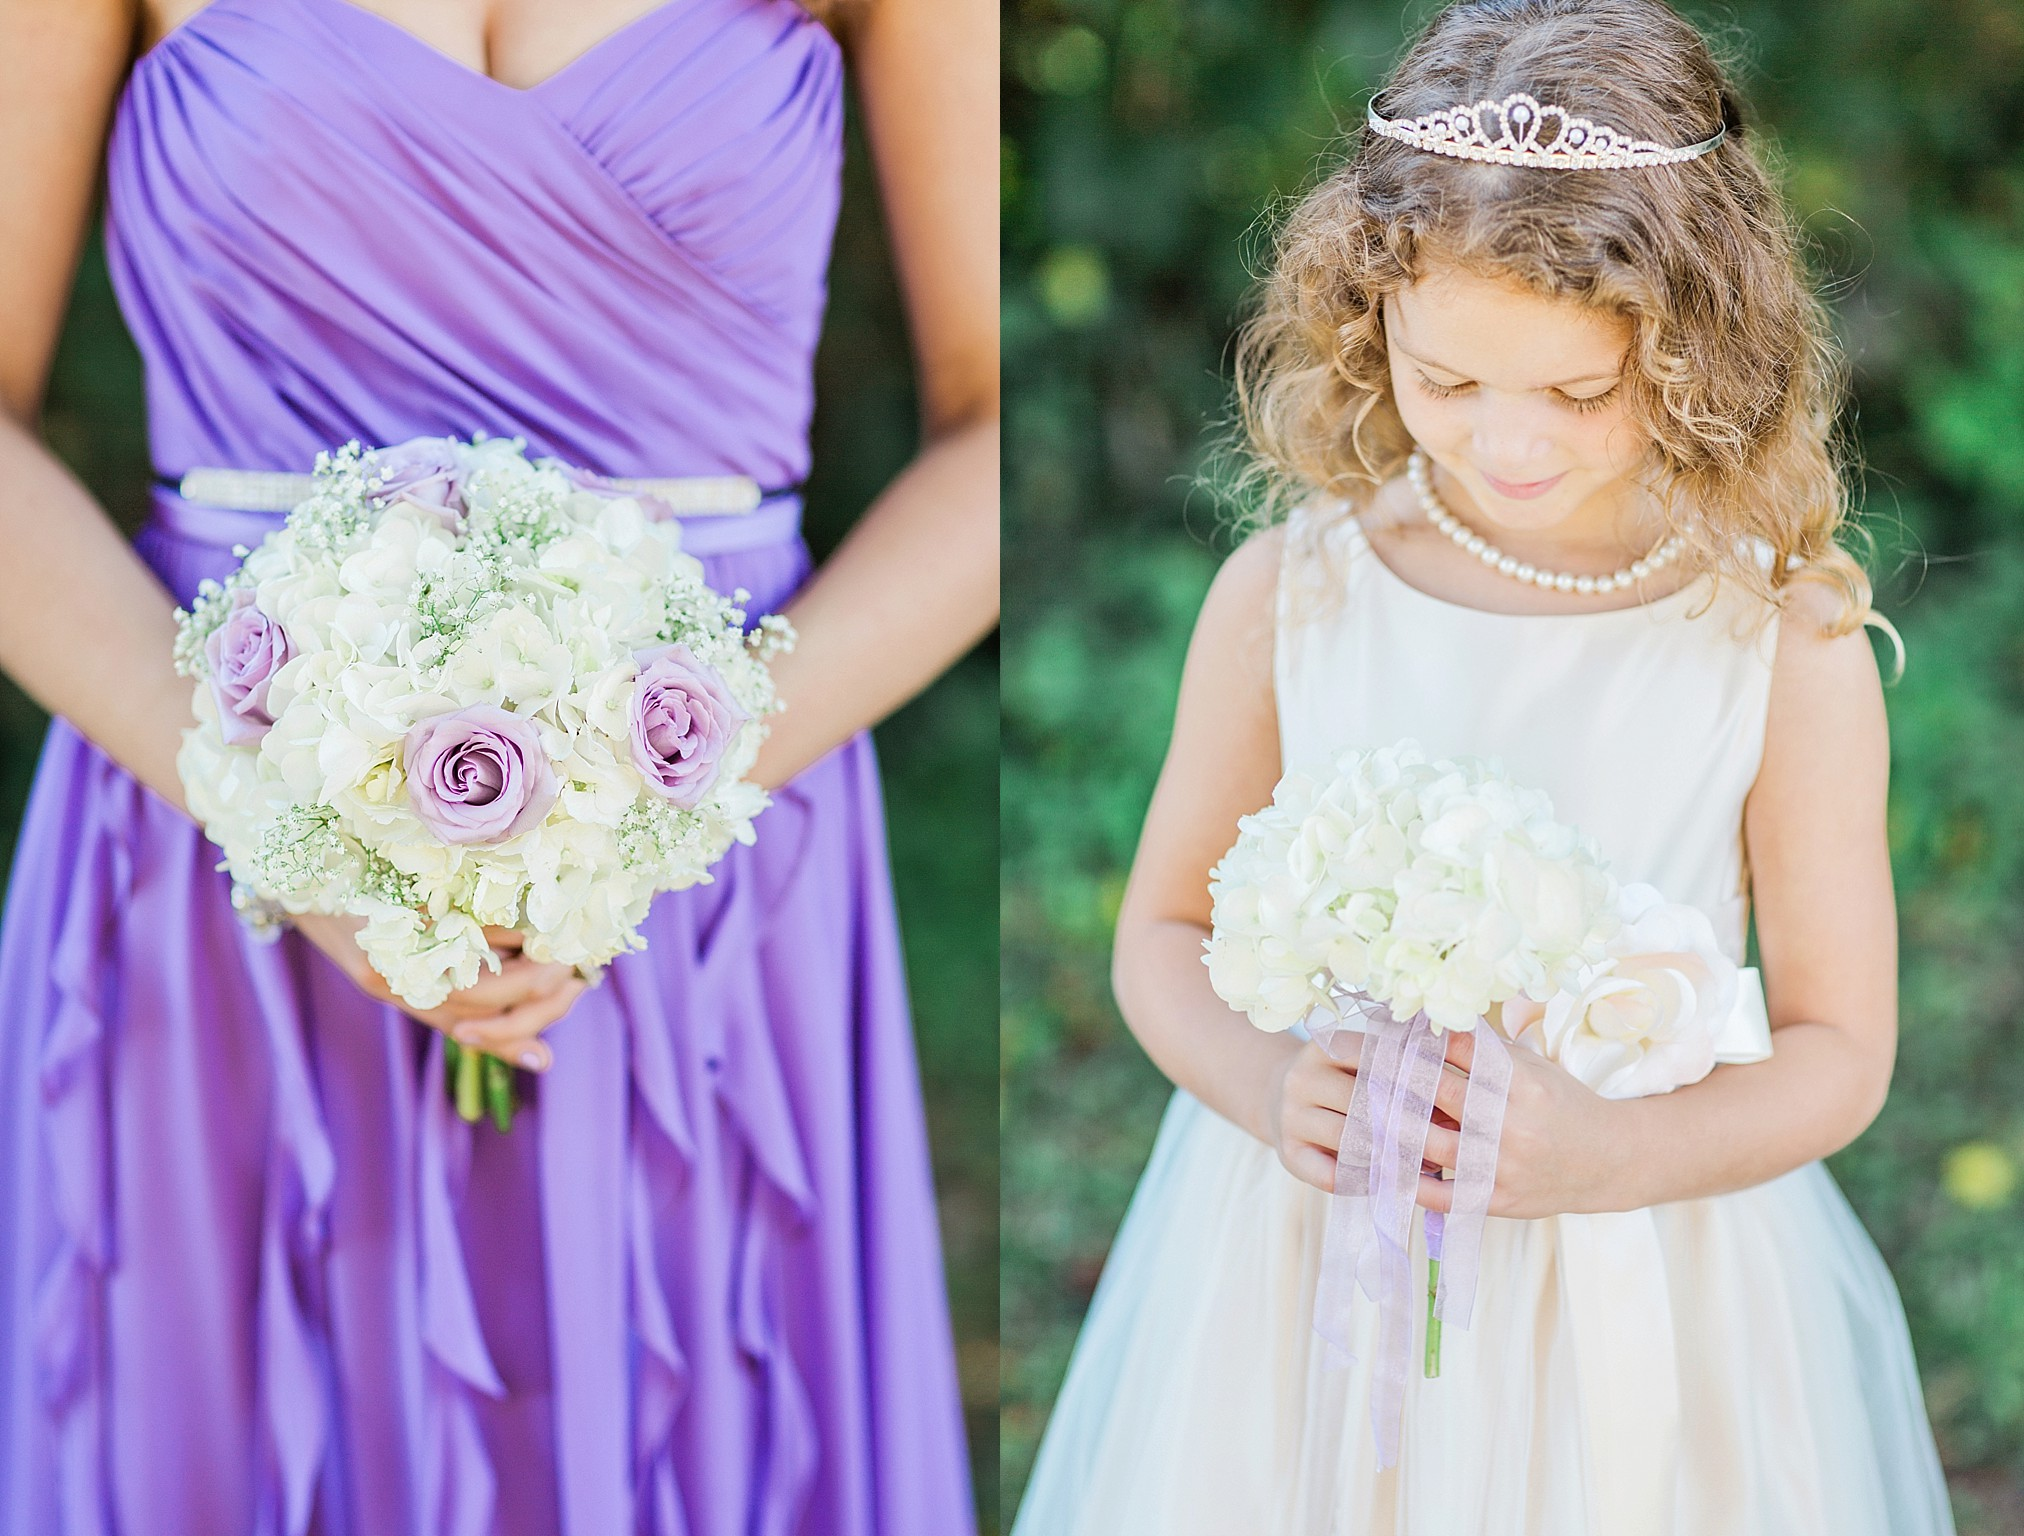 Bridesmaid Hydrangea Lavender Rose Babys Breath Bouquet Scentsational Florals